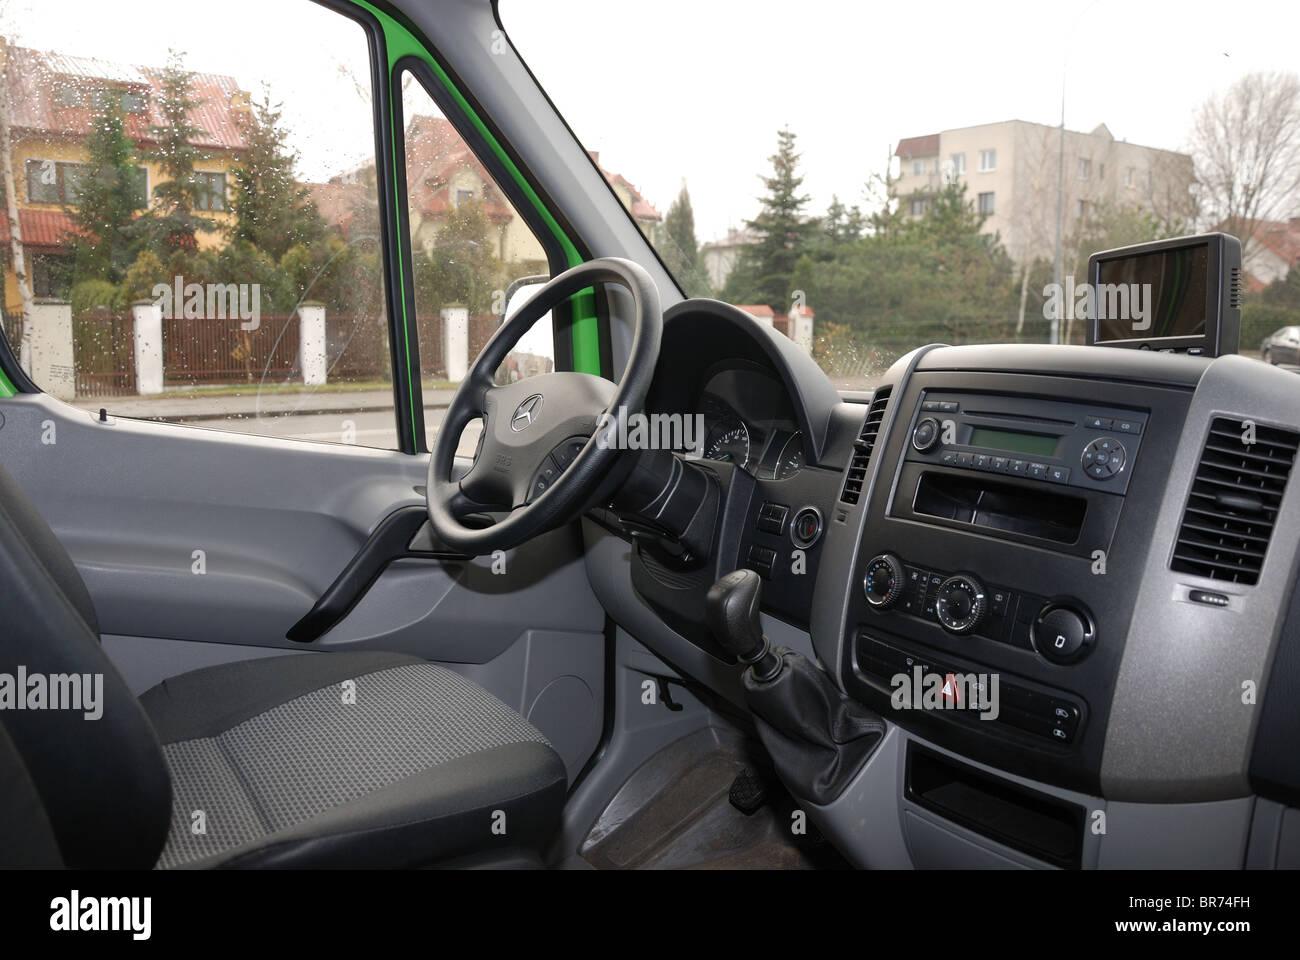 Mercedes Benz Sprinter 260 Cdi Van Green L3h2 German Mcv Panel Stock Photo Royalty Free